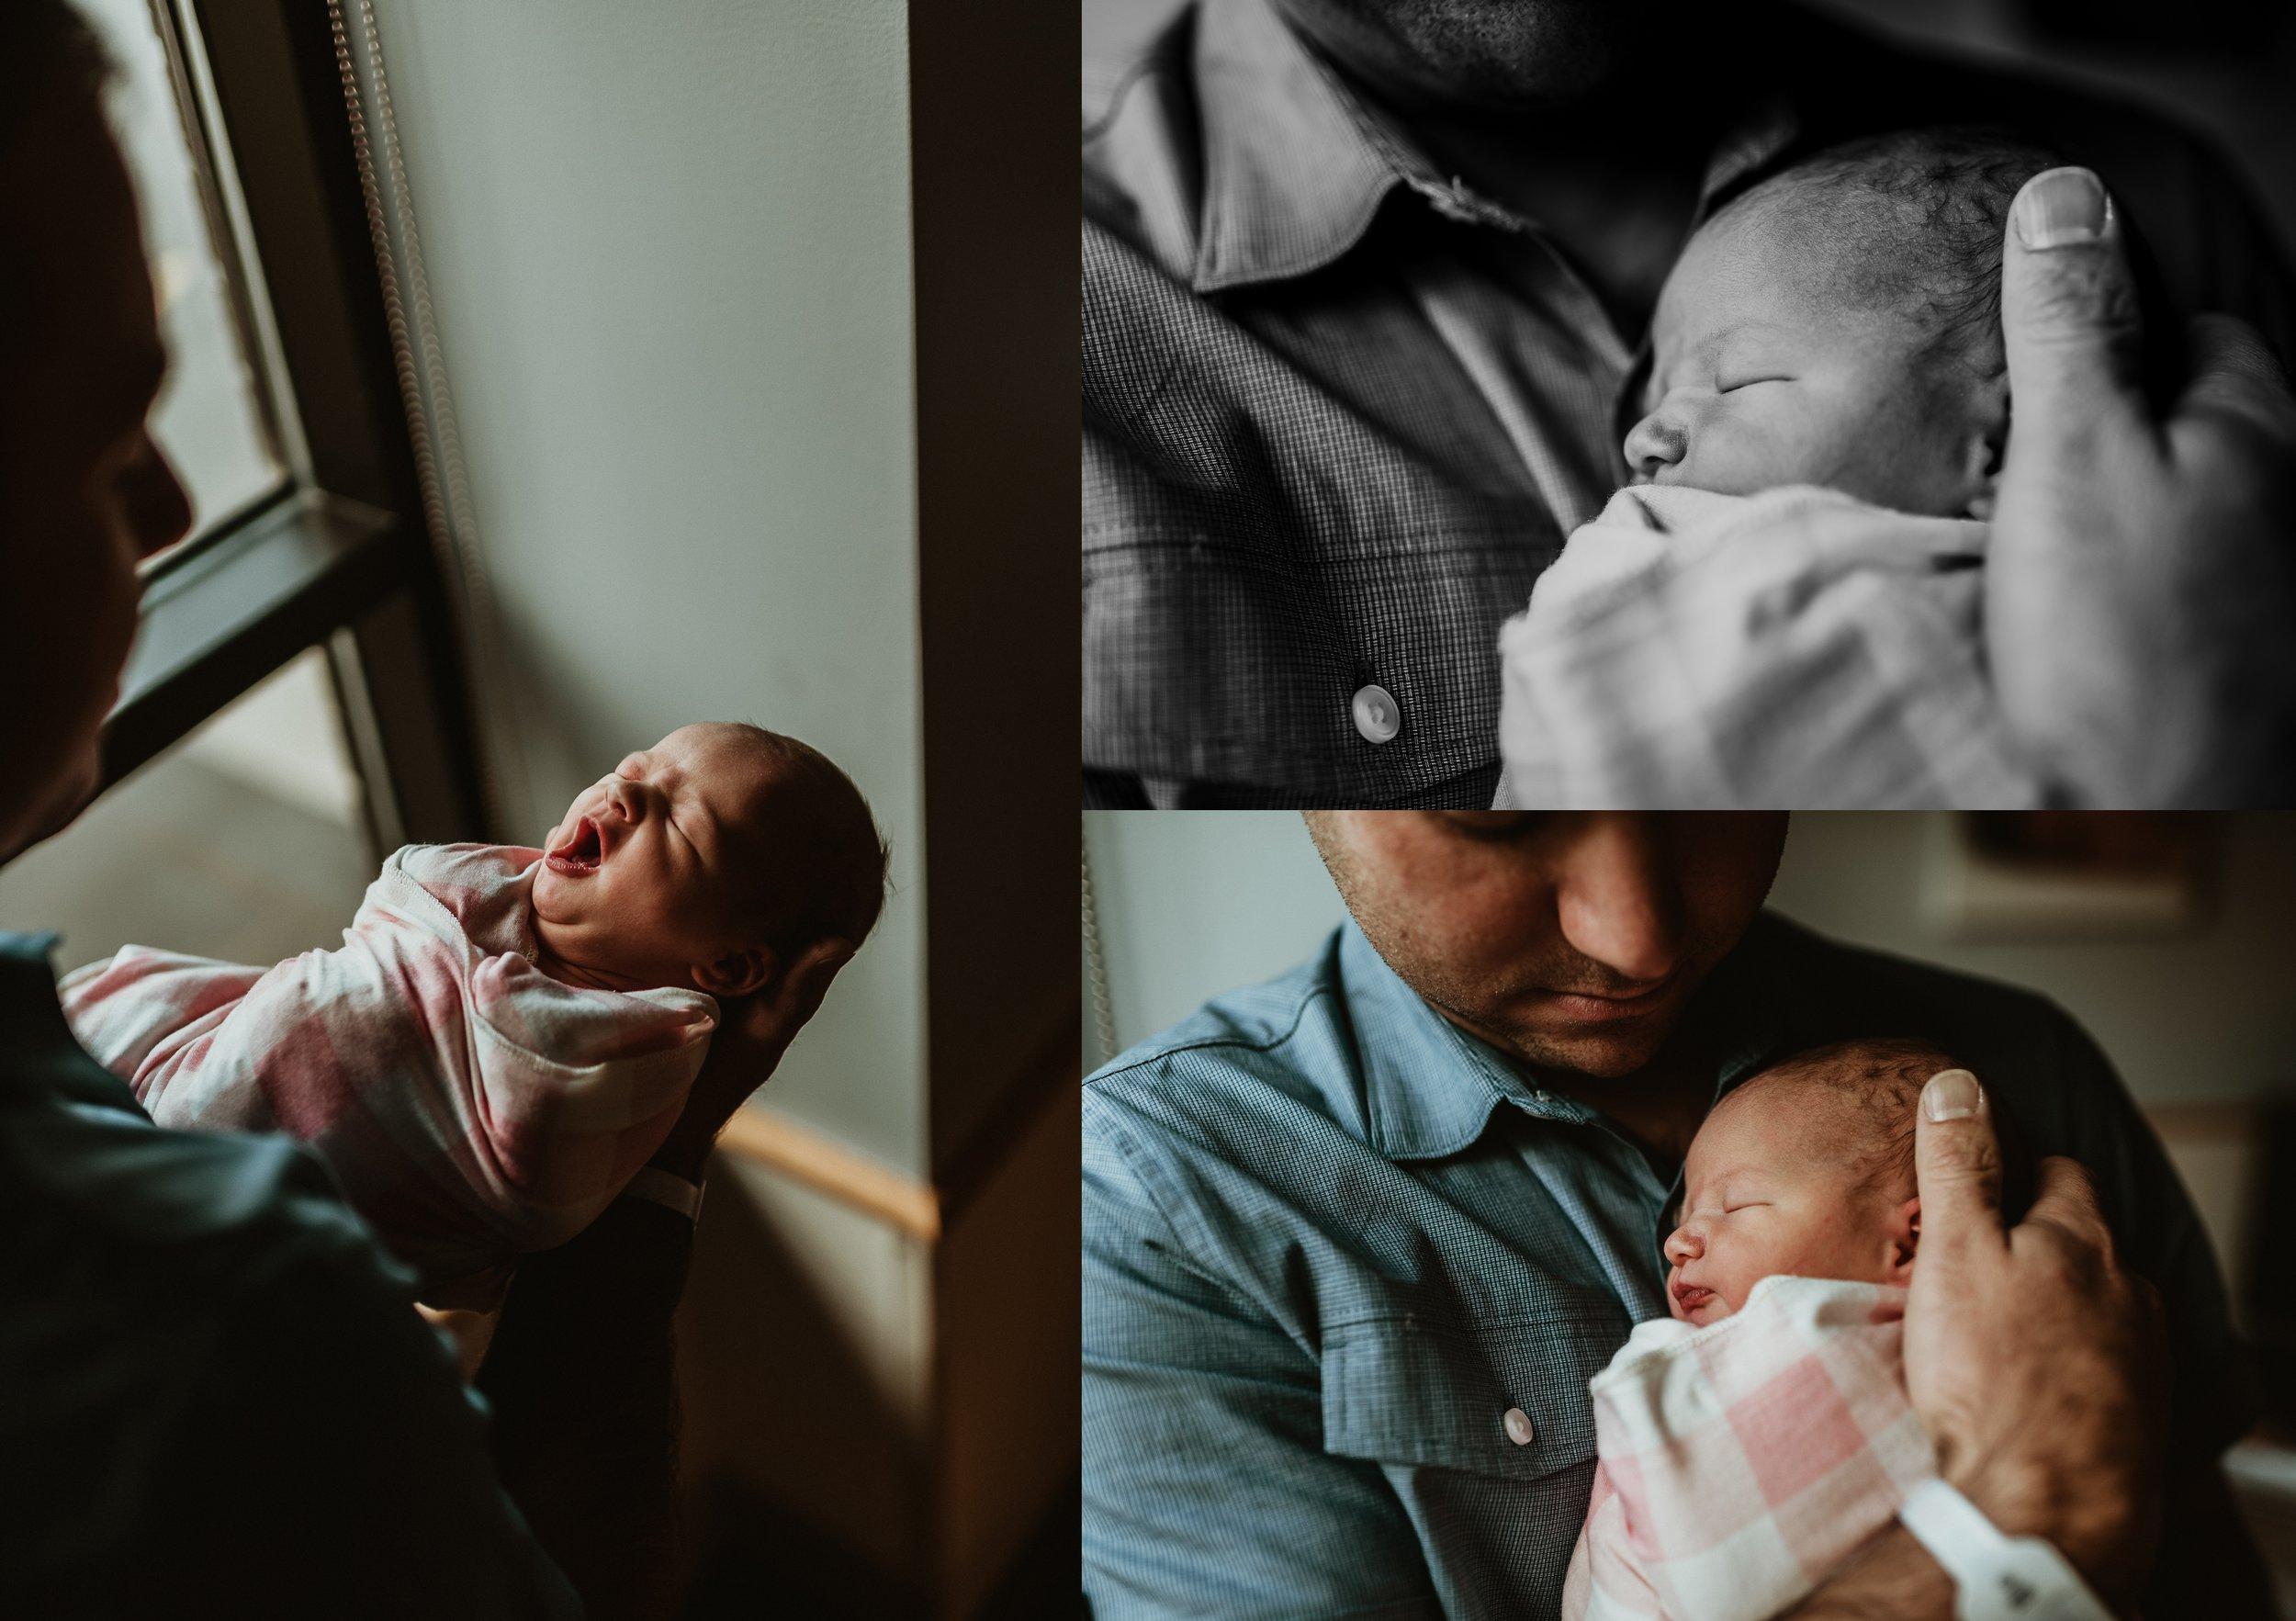 Fresh 48 Session   Terry Farms Photography   Newborn Photo   Hospital Newborn Photography   Documentary Photography   Toledo, Ohio